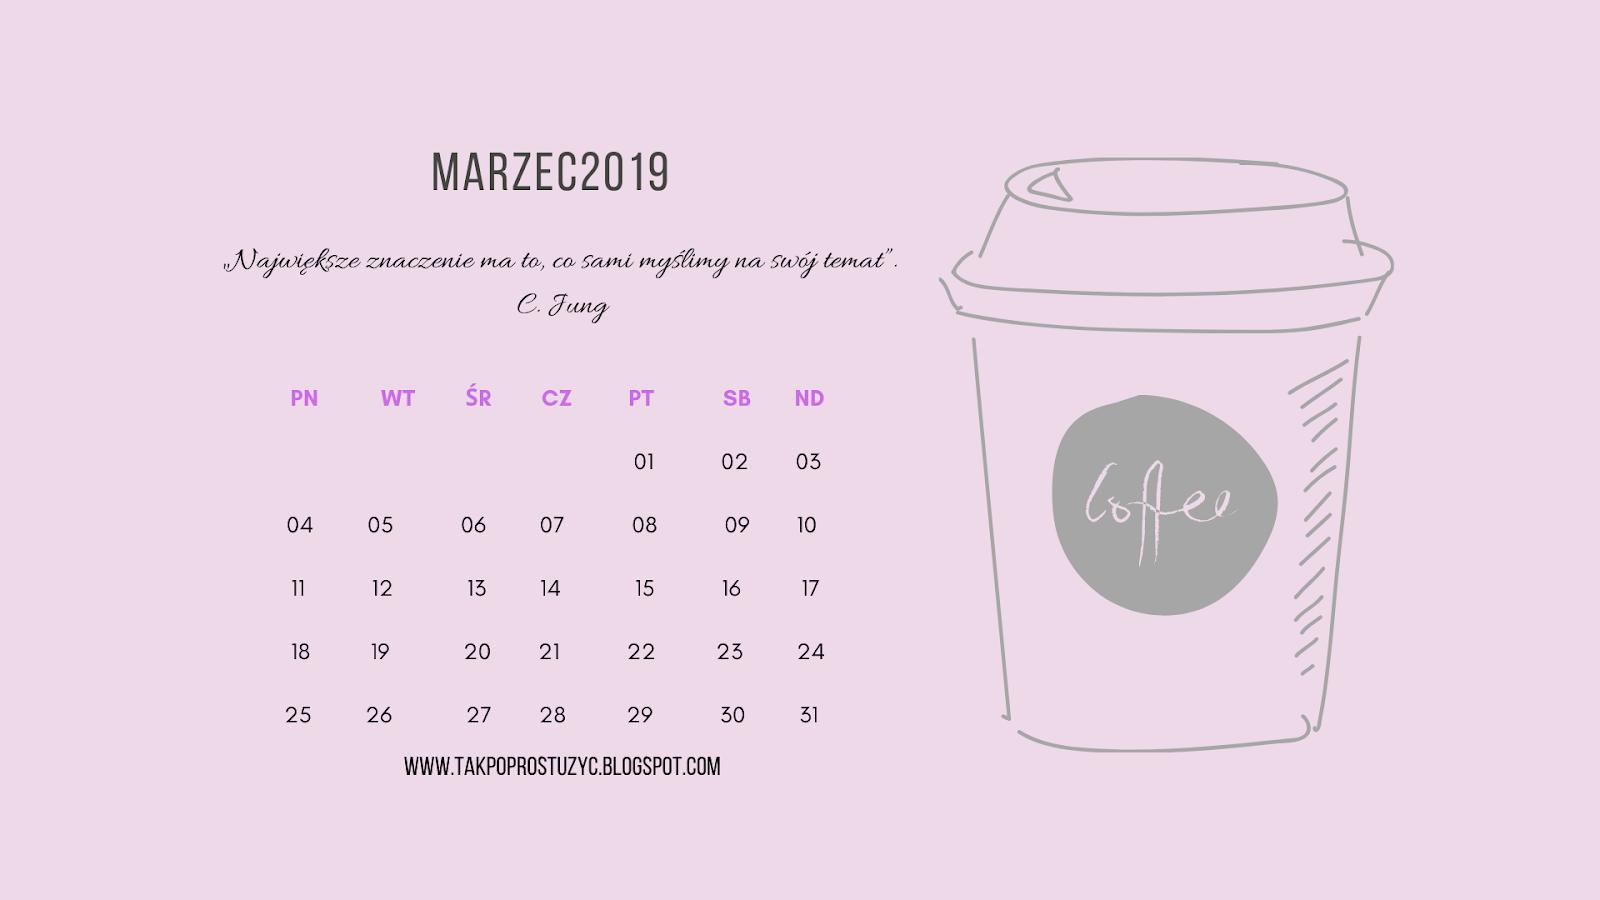 Kalendarz Na Marzec 2019 Tapeta Na Pulpit Do Pobrania